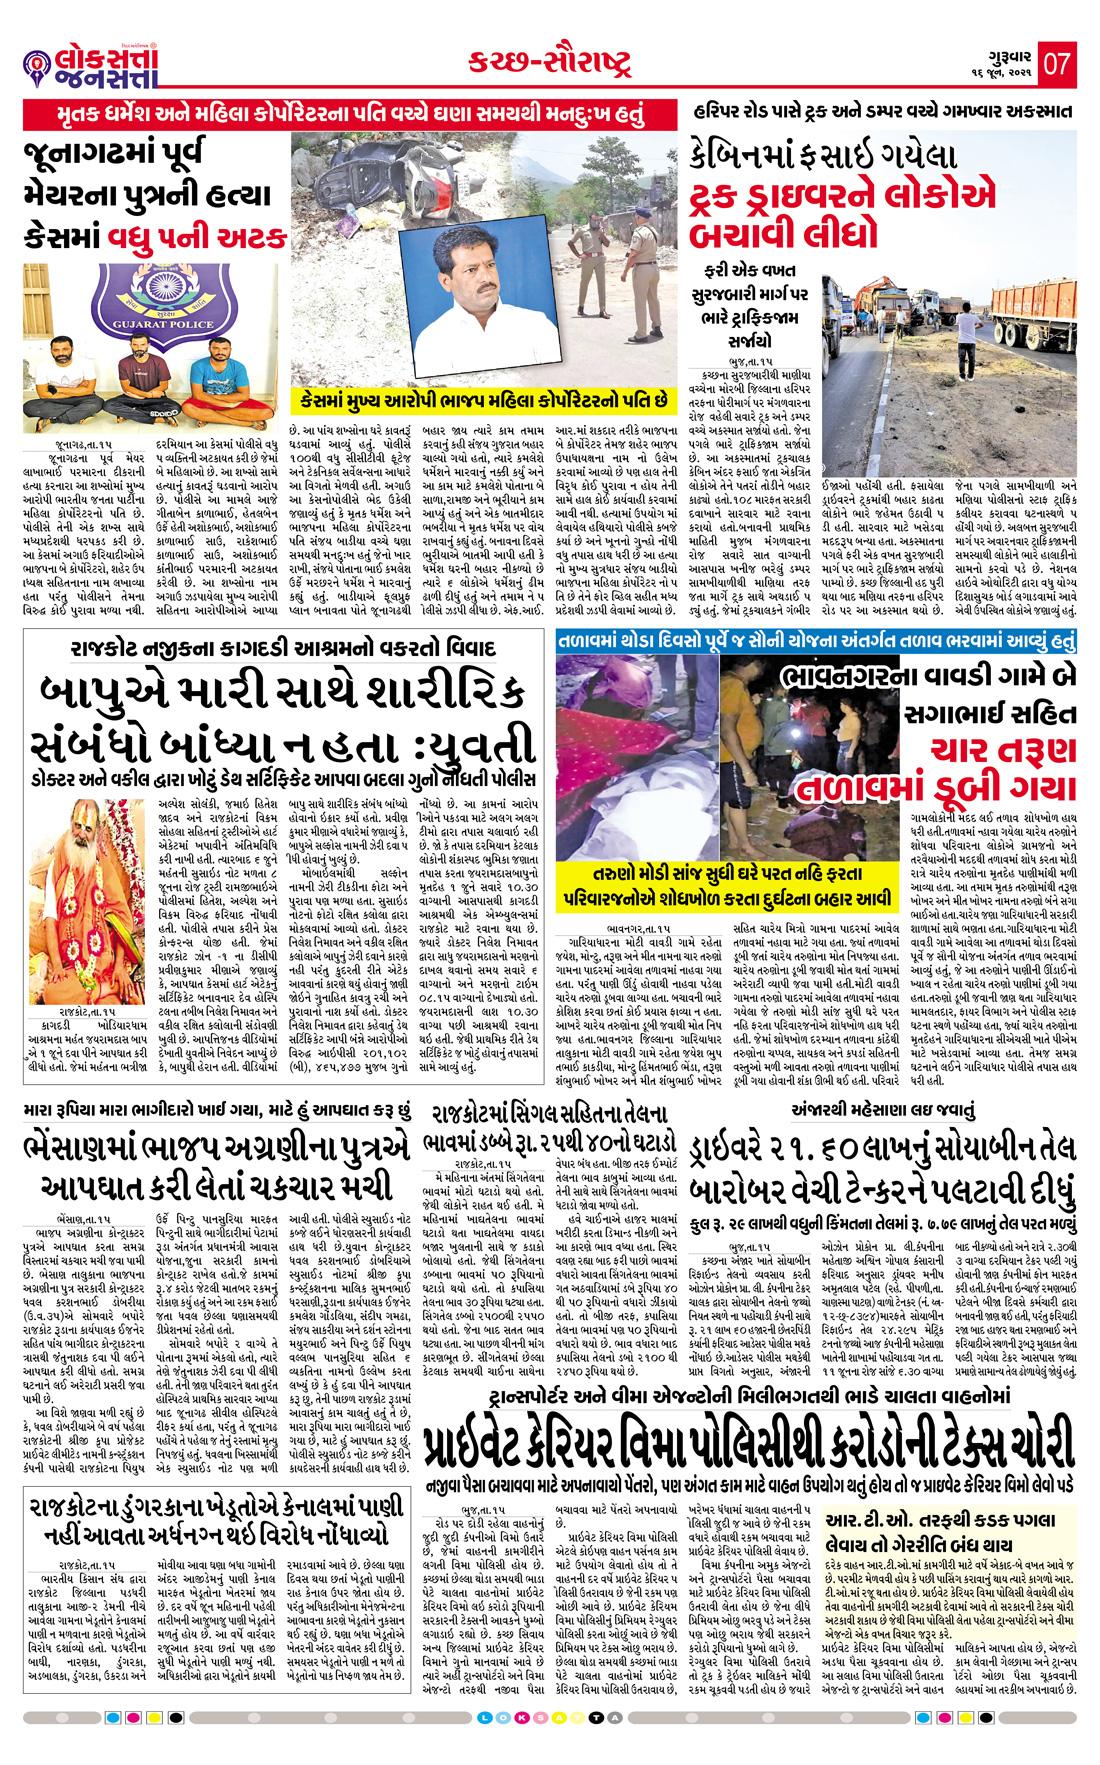 Loksatta Jansatta News Papaer E-paper dated 2021-06-16 | Page 7